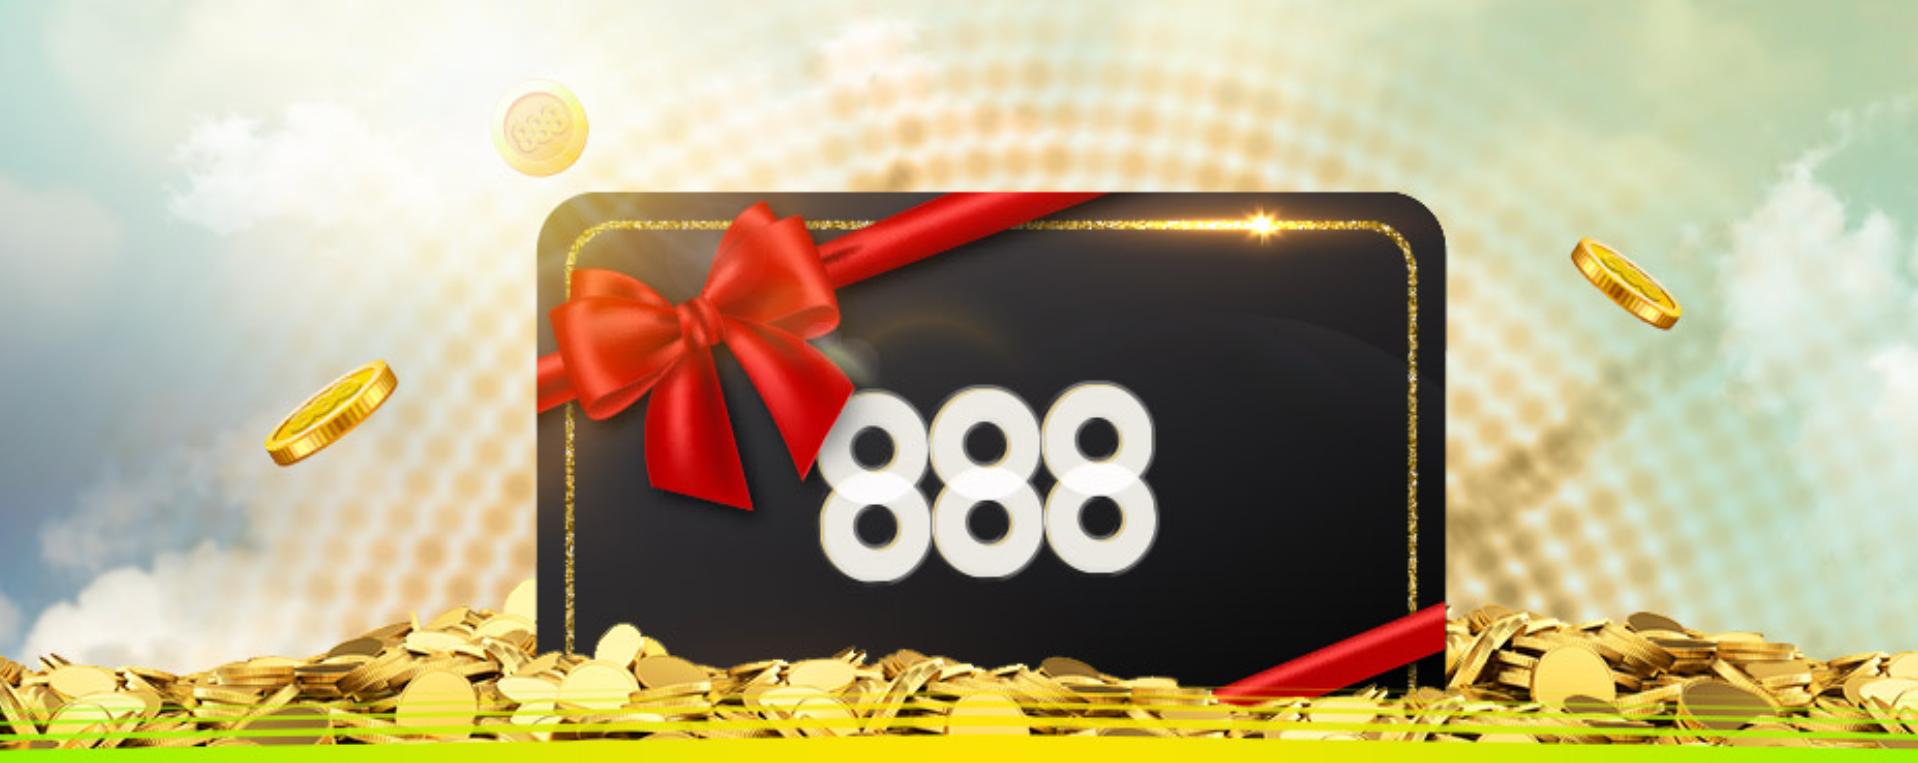 888 Casino On Mobile